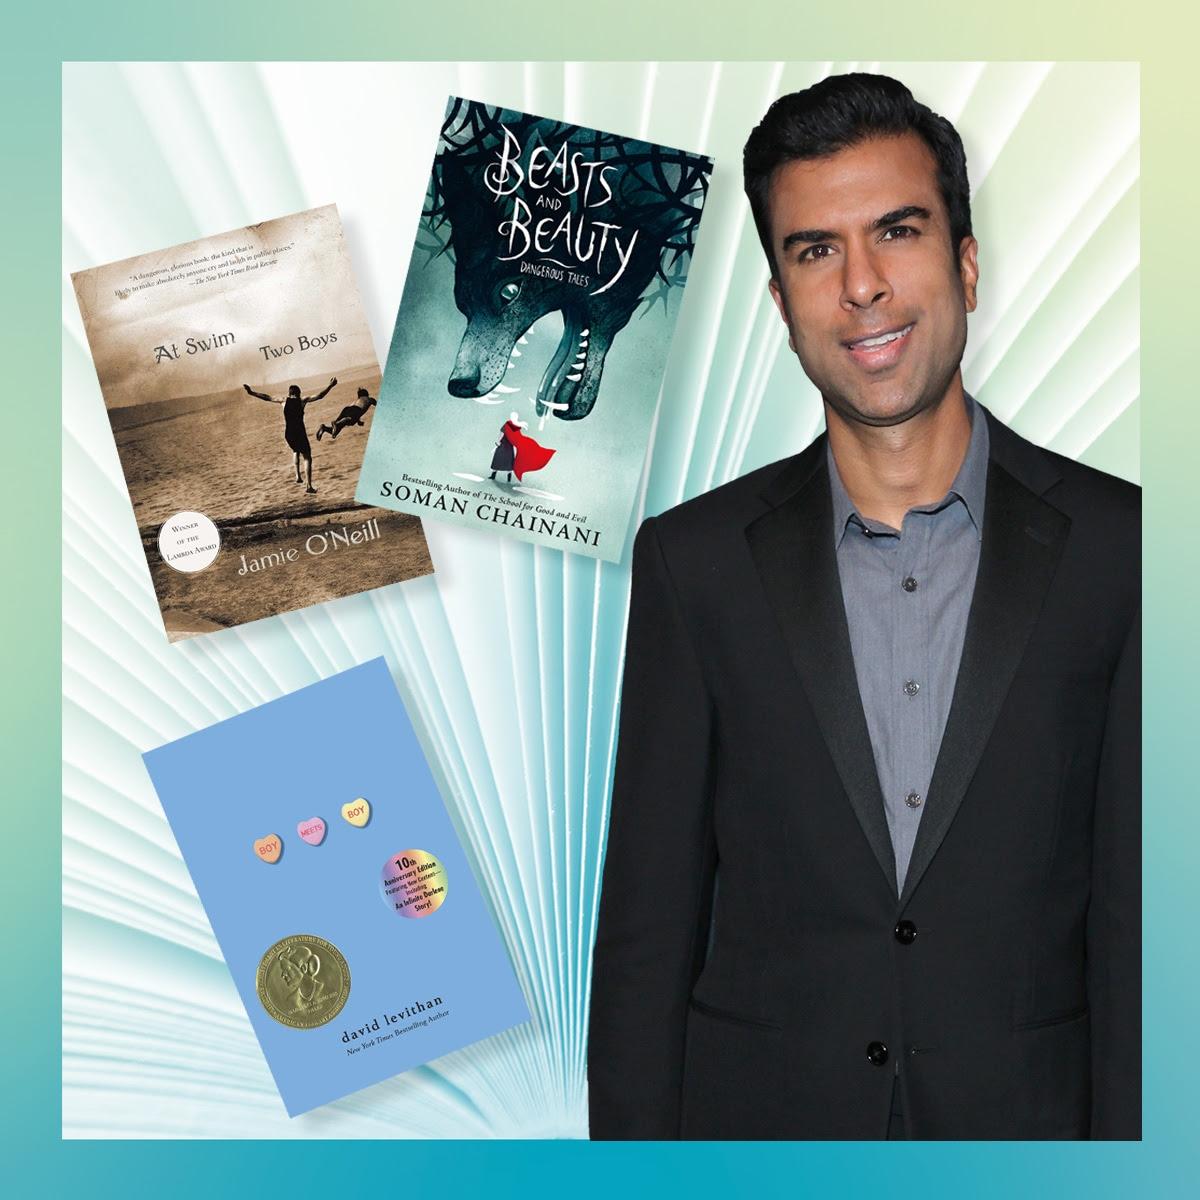 Soman Chainani Shares His Must-Read LGBTQ+ Books